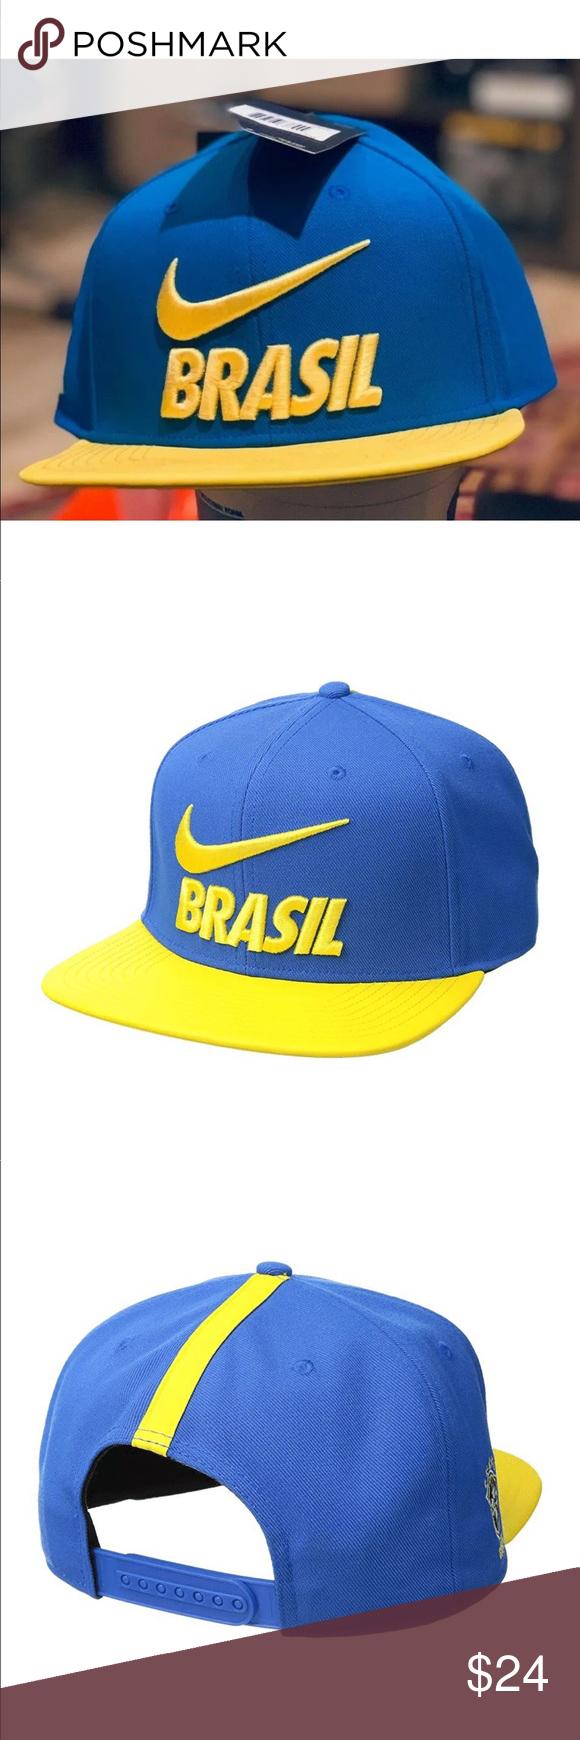 2ff785ce8ff Nike Brasil Football 2018 Pro Adjustable Hat Nike Brasil 2018 Pro Hat NEW  WITH TAGS SIZE